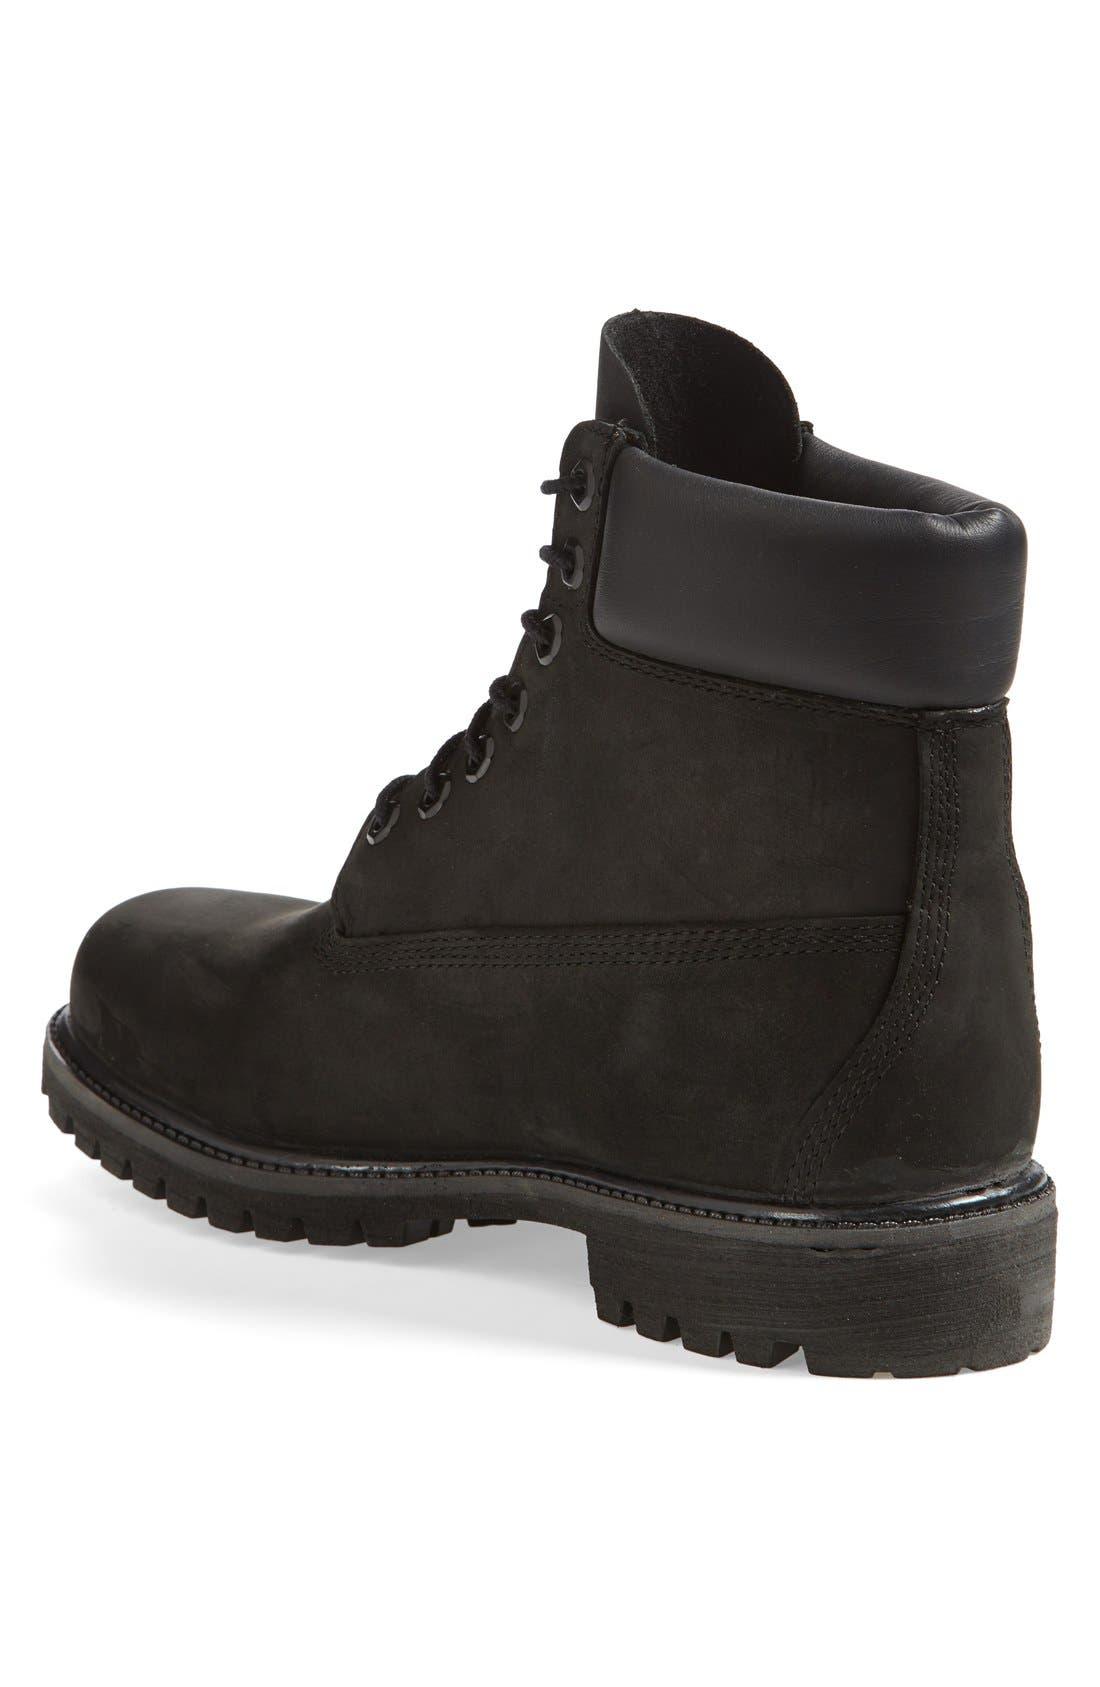 'Six Inch Classic Boots - Premium' Boot,                             Alternate thumbnail 2, color,                             Black